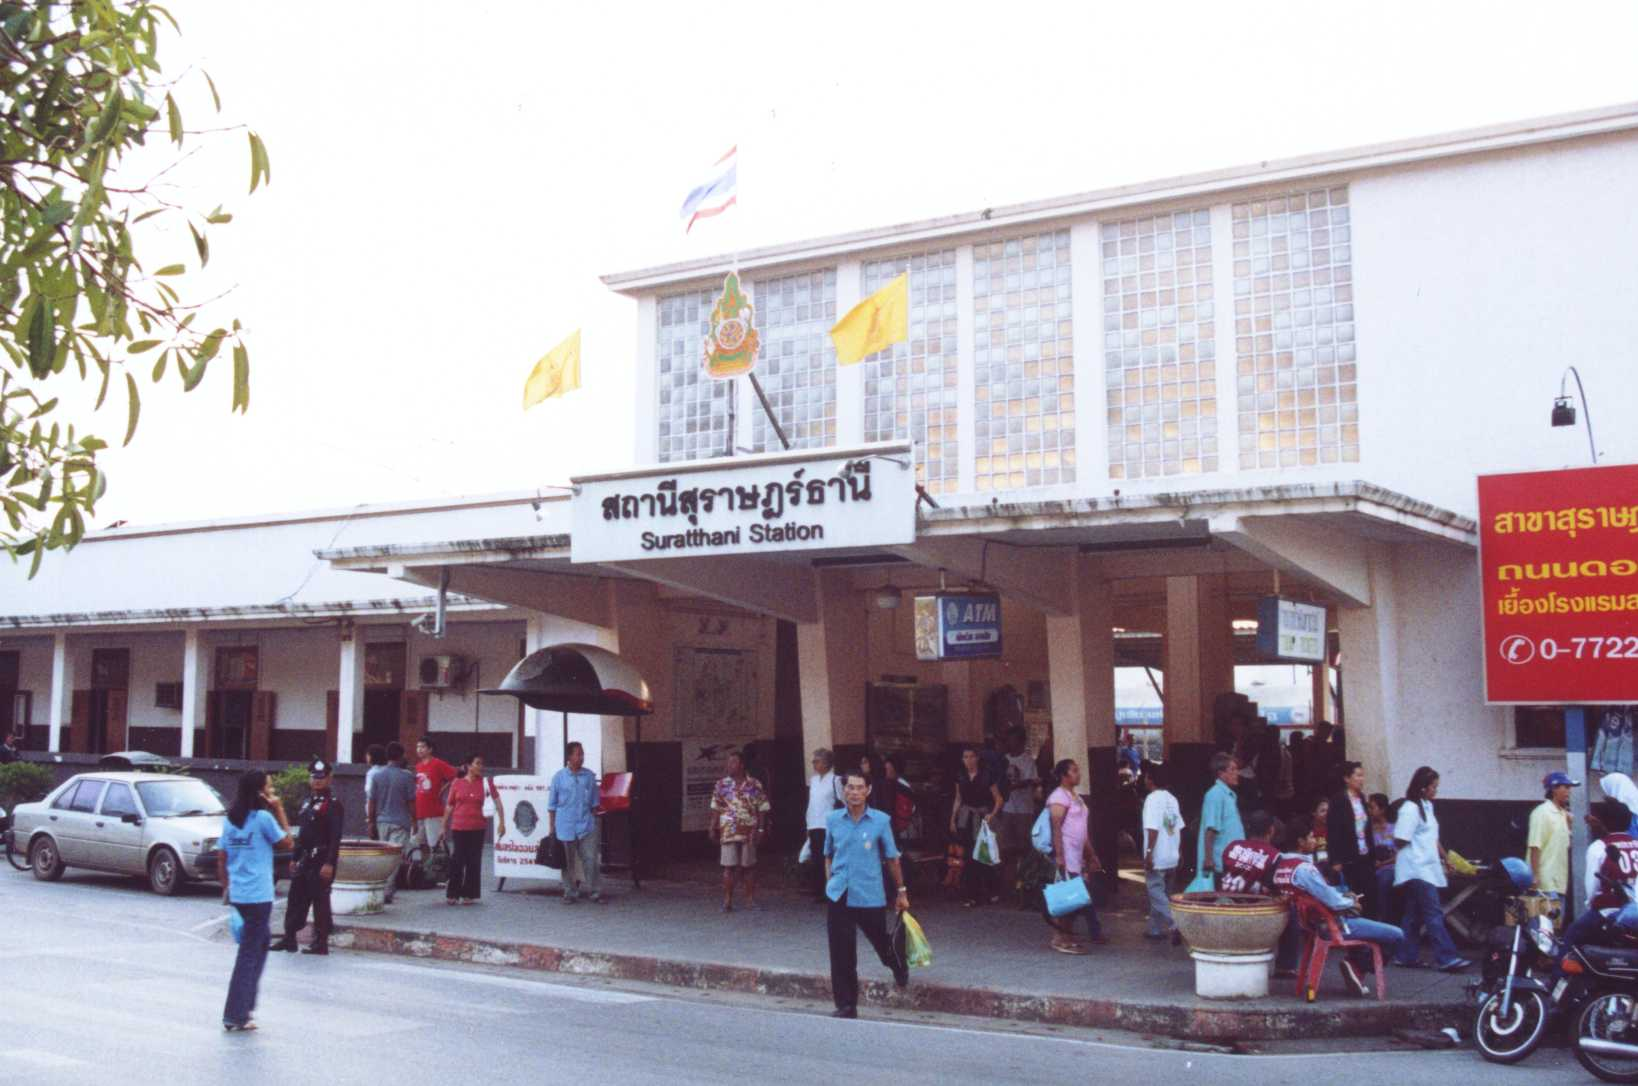 Hotels Near Surat Station